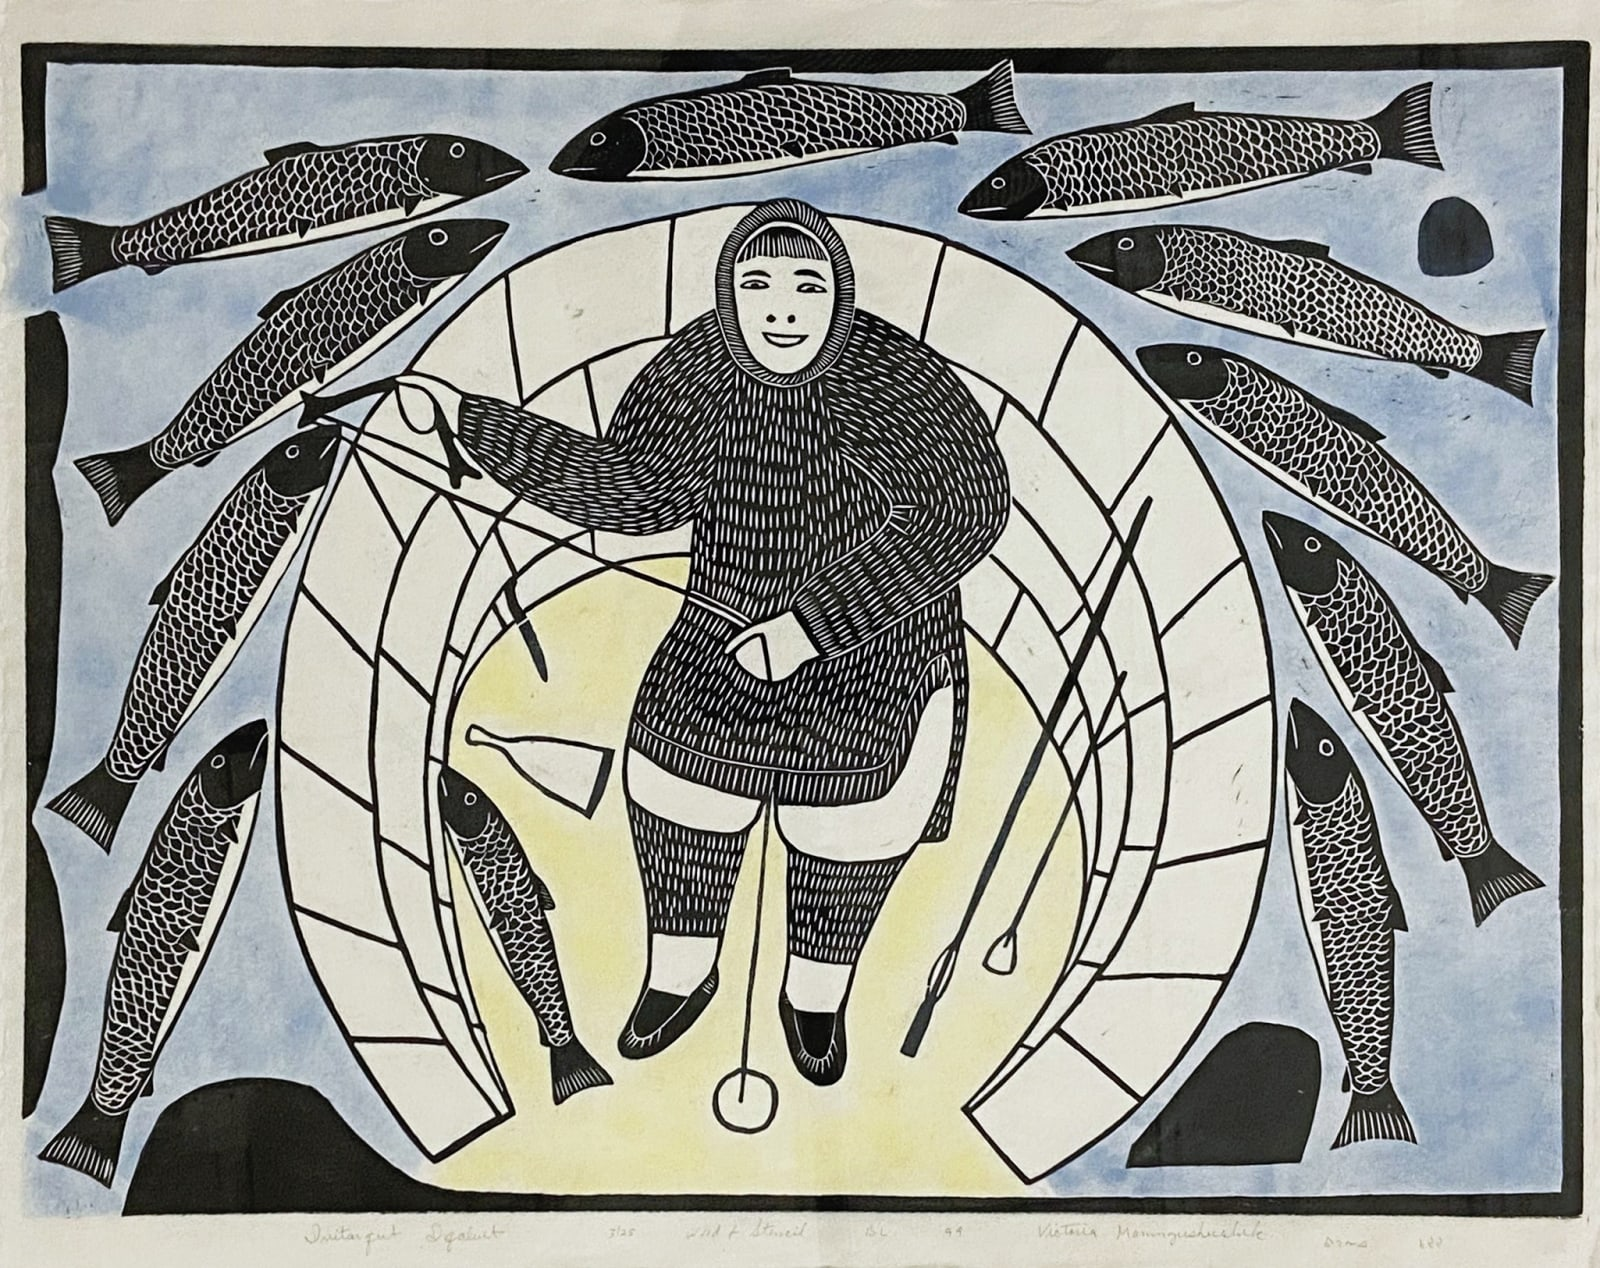 VICTORIA MAMNGUQSUALUK (1930-2016) QAMANI'TUAQ (BAKER LAKE) Ivitarqut Iqaluit, 1999 woodcut and stencil, 17 3/4 x 24 in (45.1 x 61 cm) ESTIMATE: $400 — $600 New Price: $300